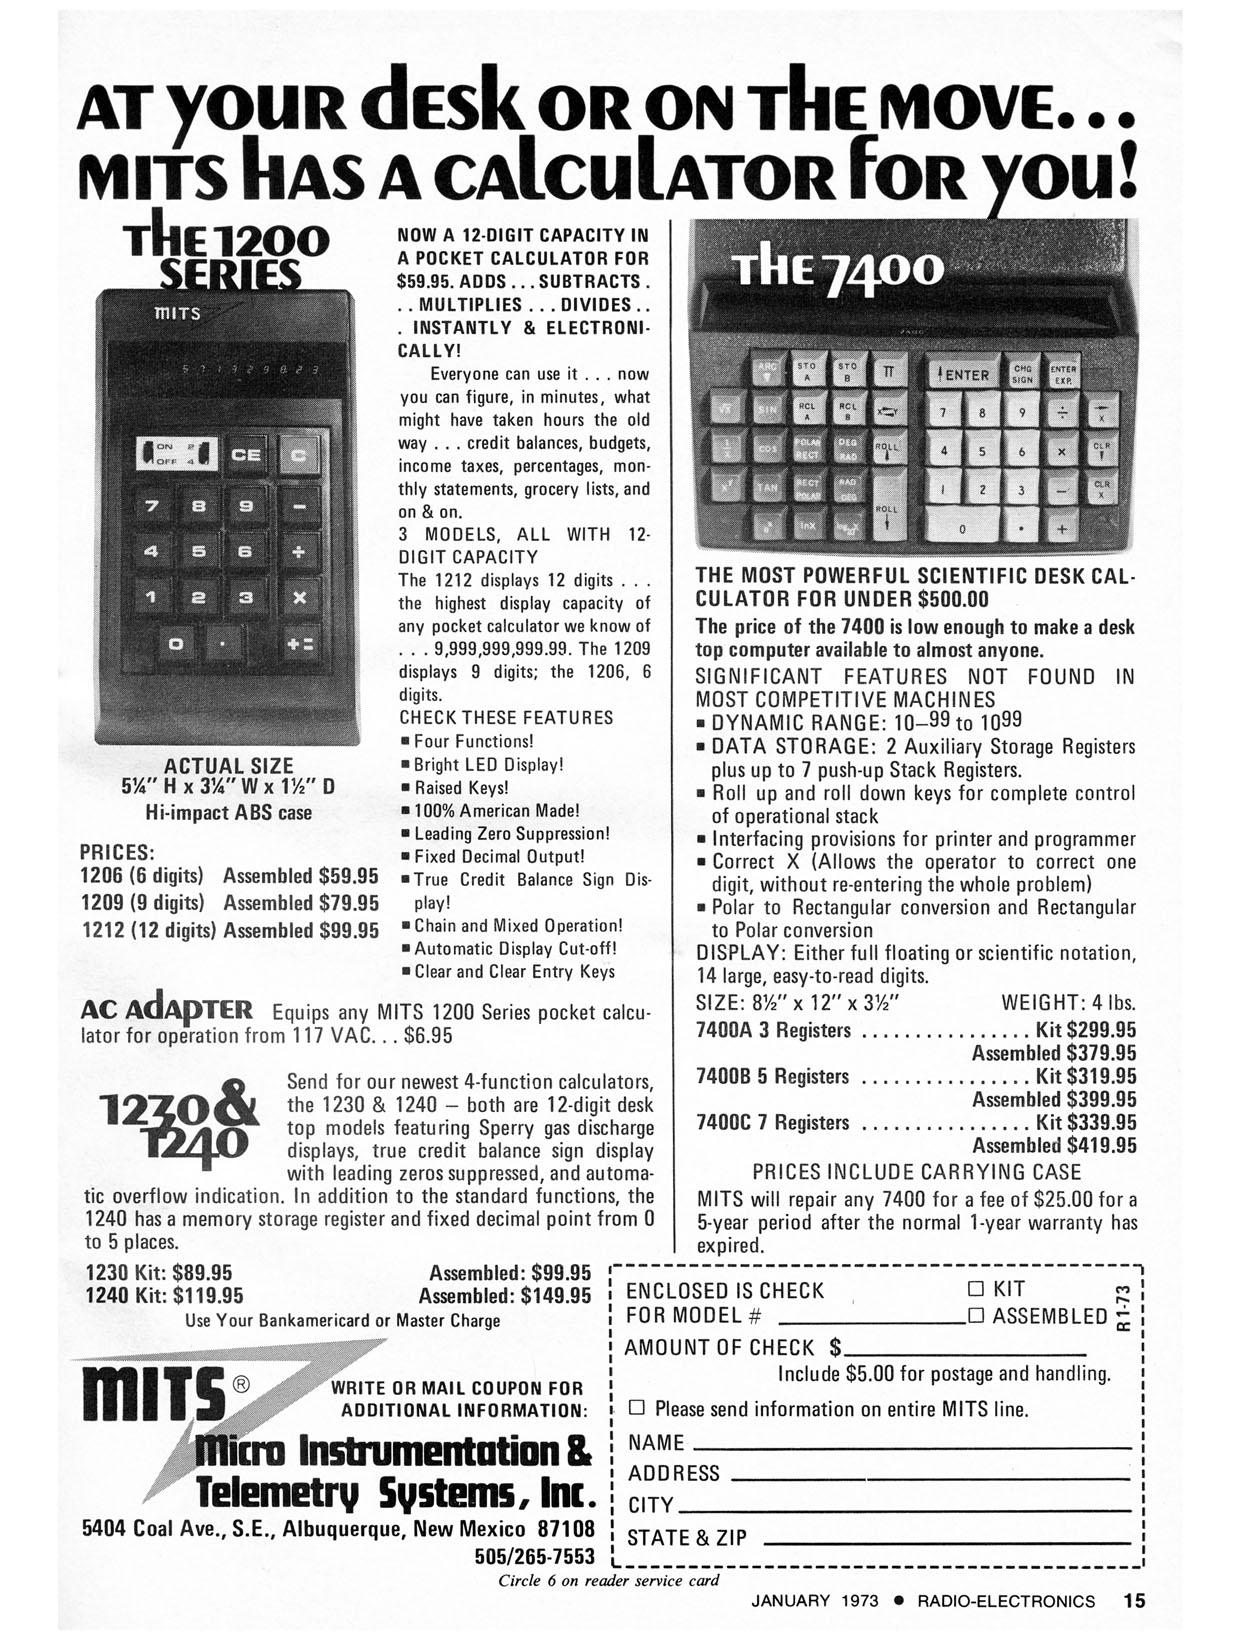 File Mits Calculators 1973 Jpg Wikimedia Commons